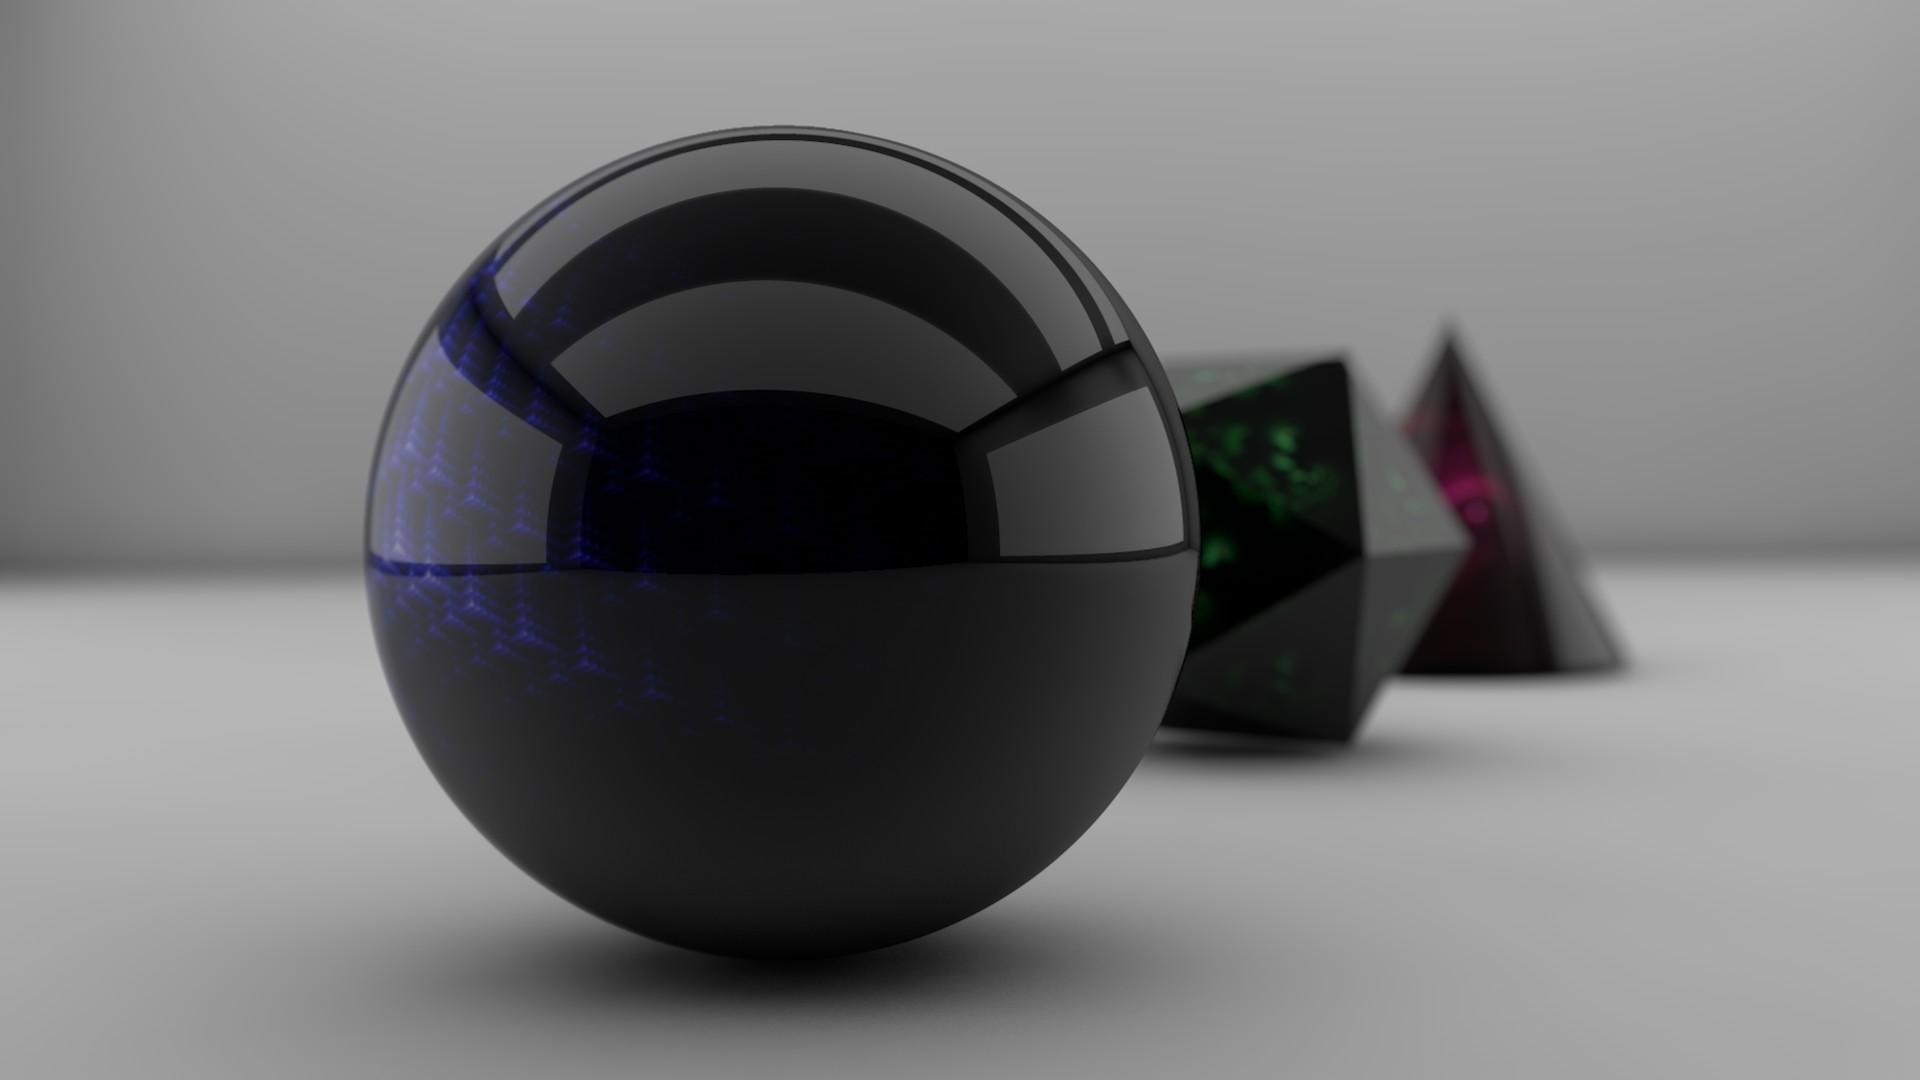 3d Glass Full Hd Wallpaper Hd Ball Shape Shadow Figures Wallpaper Download Free